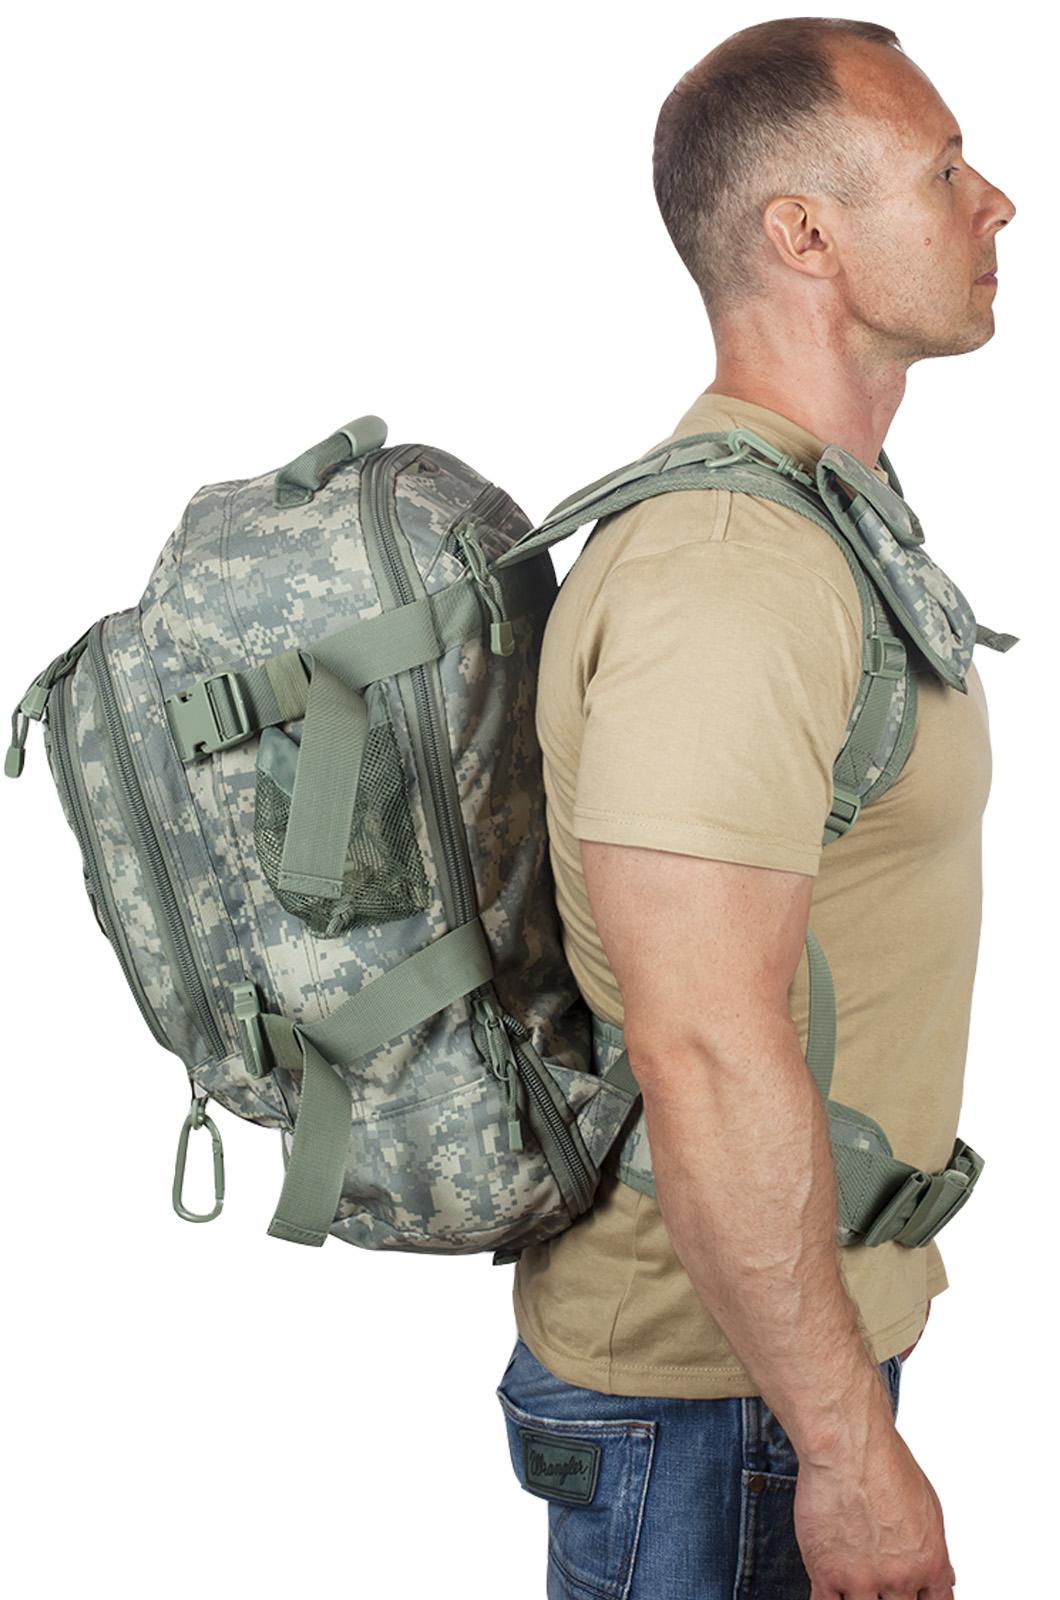 Натовский тактический рюкзак с гидратором 3-Day Expandable Backpack ACU с доставкой